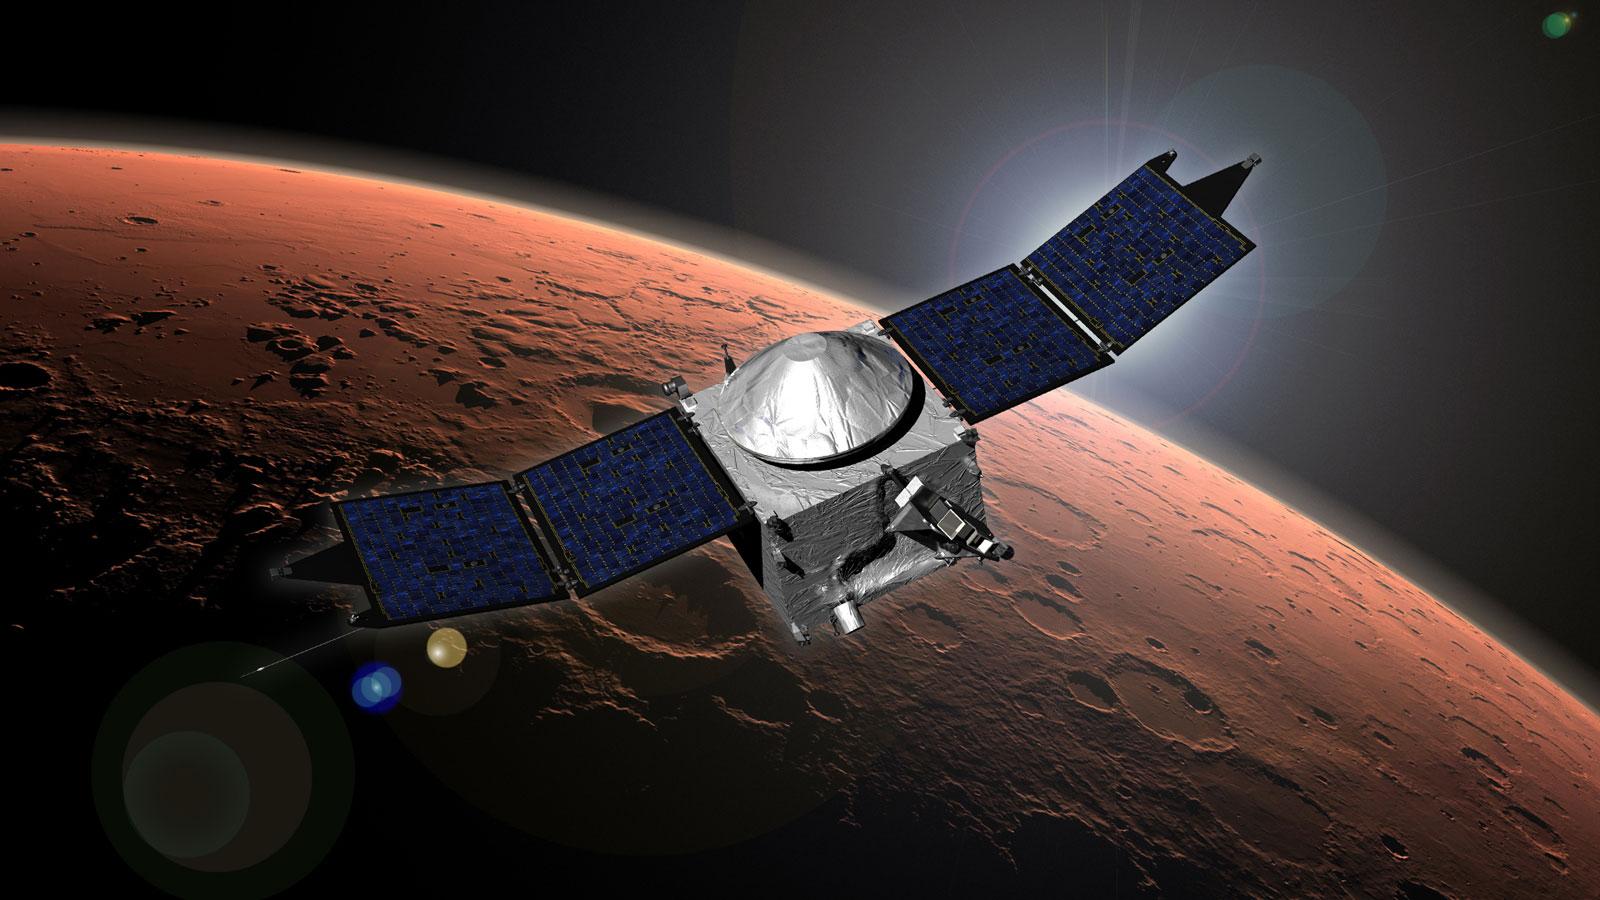 Figure 3: The MAVEN orbiter as it orbits Mars. Credit: NASA/Goddard Space Flight Center